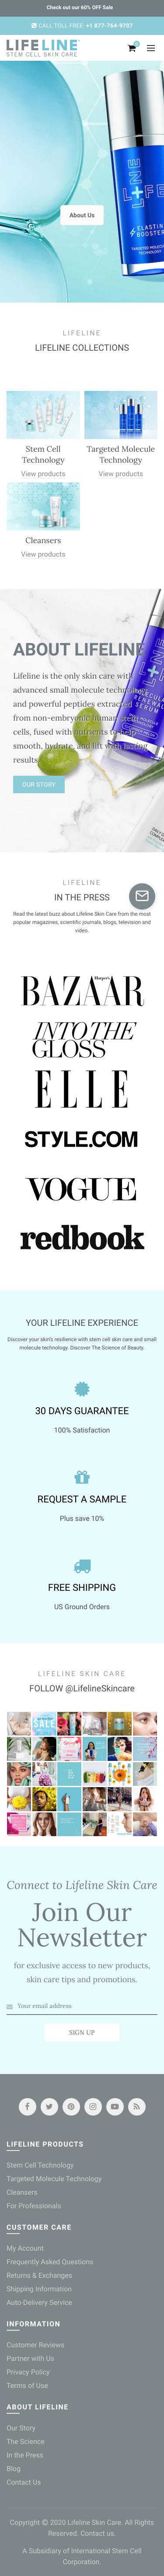 Lifeline Skin Care Coupon